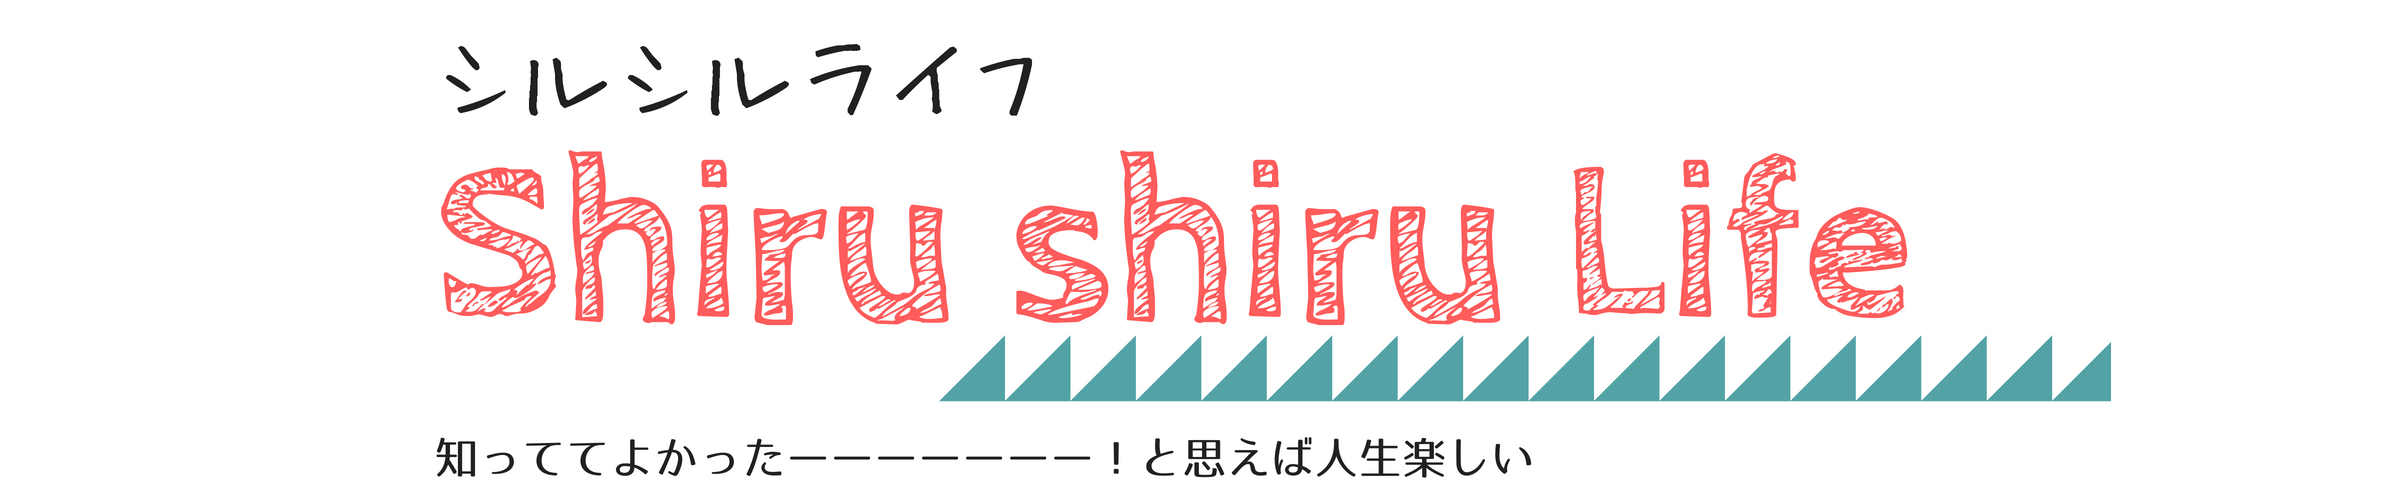 Shirushiru-Life (シルシルライフ)